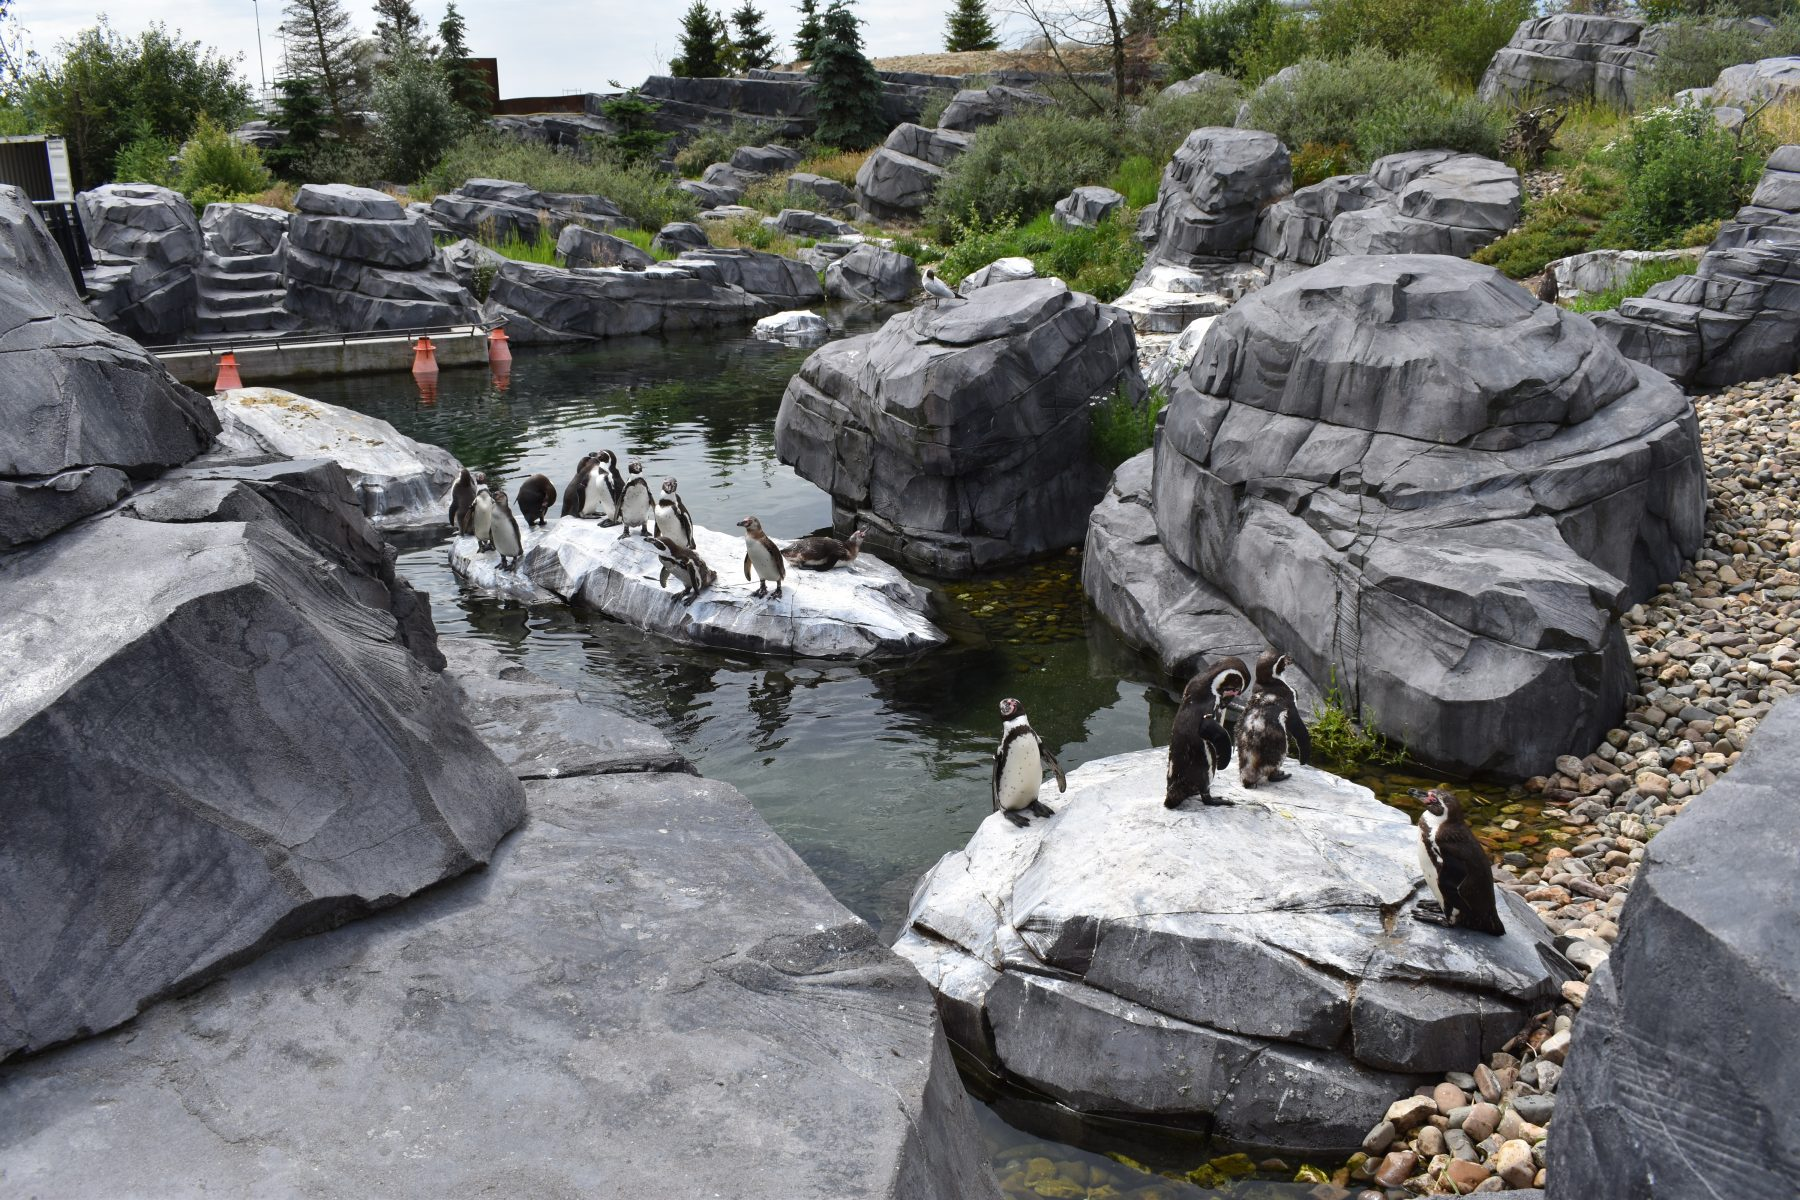 Humboldtpinguin zoo